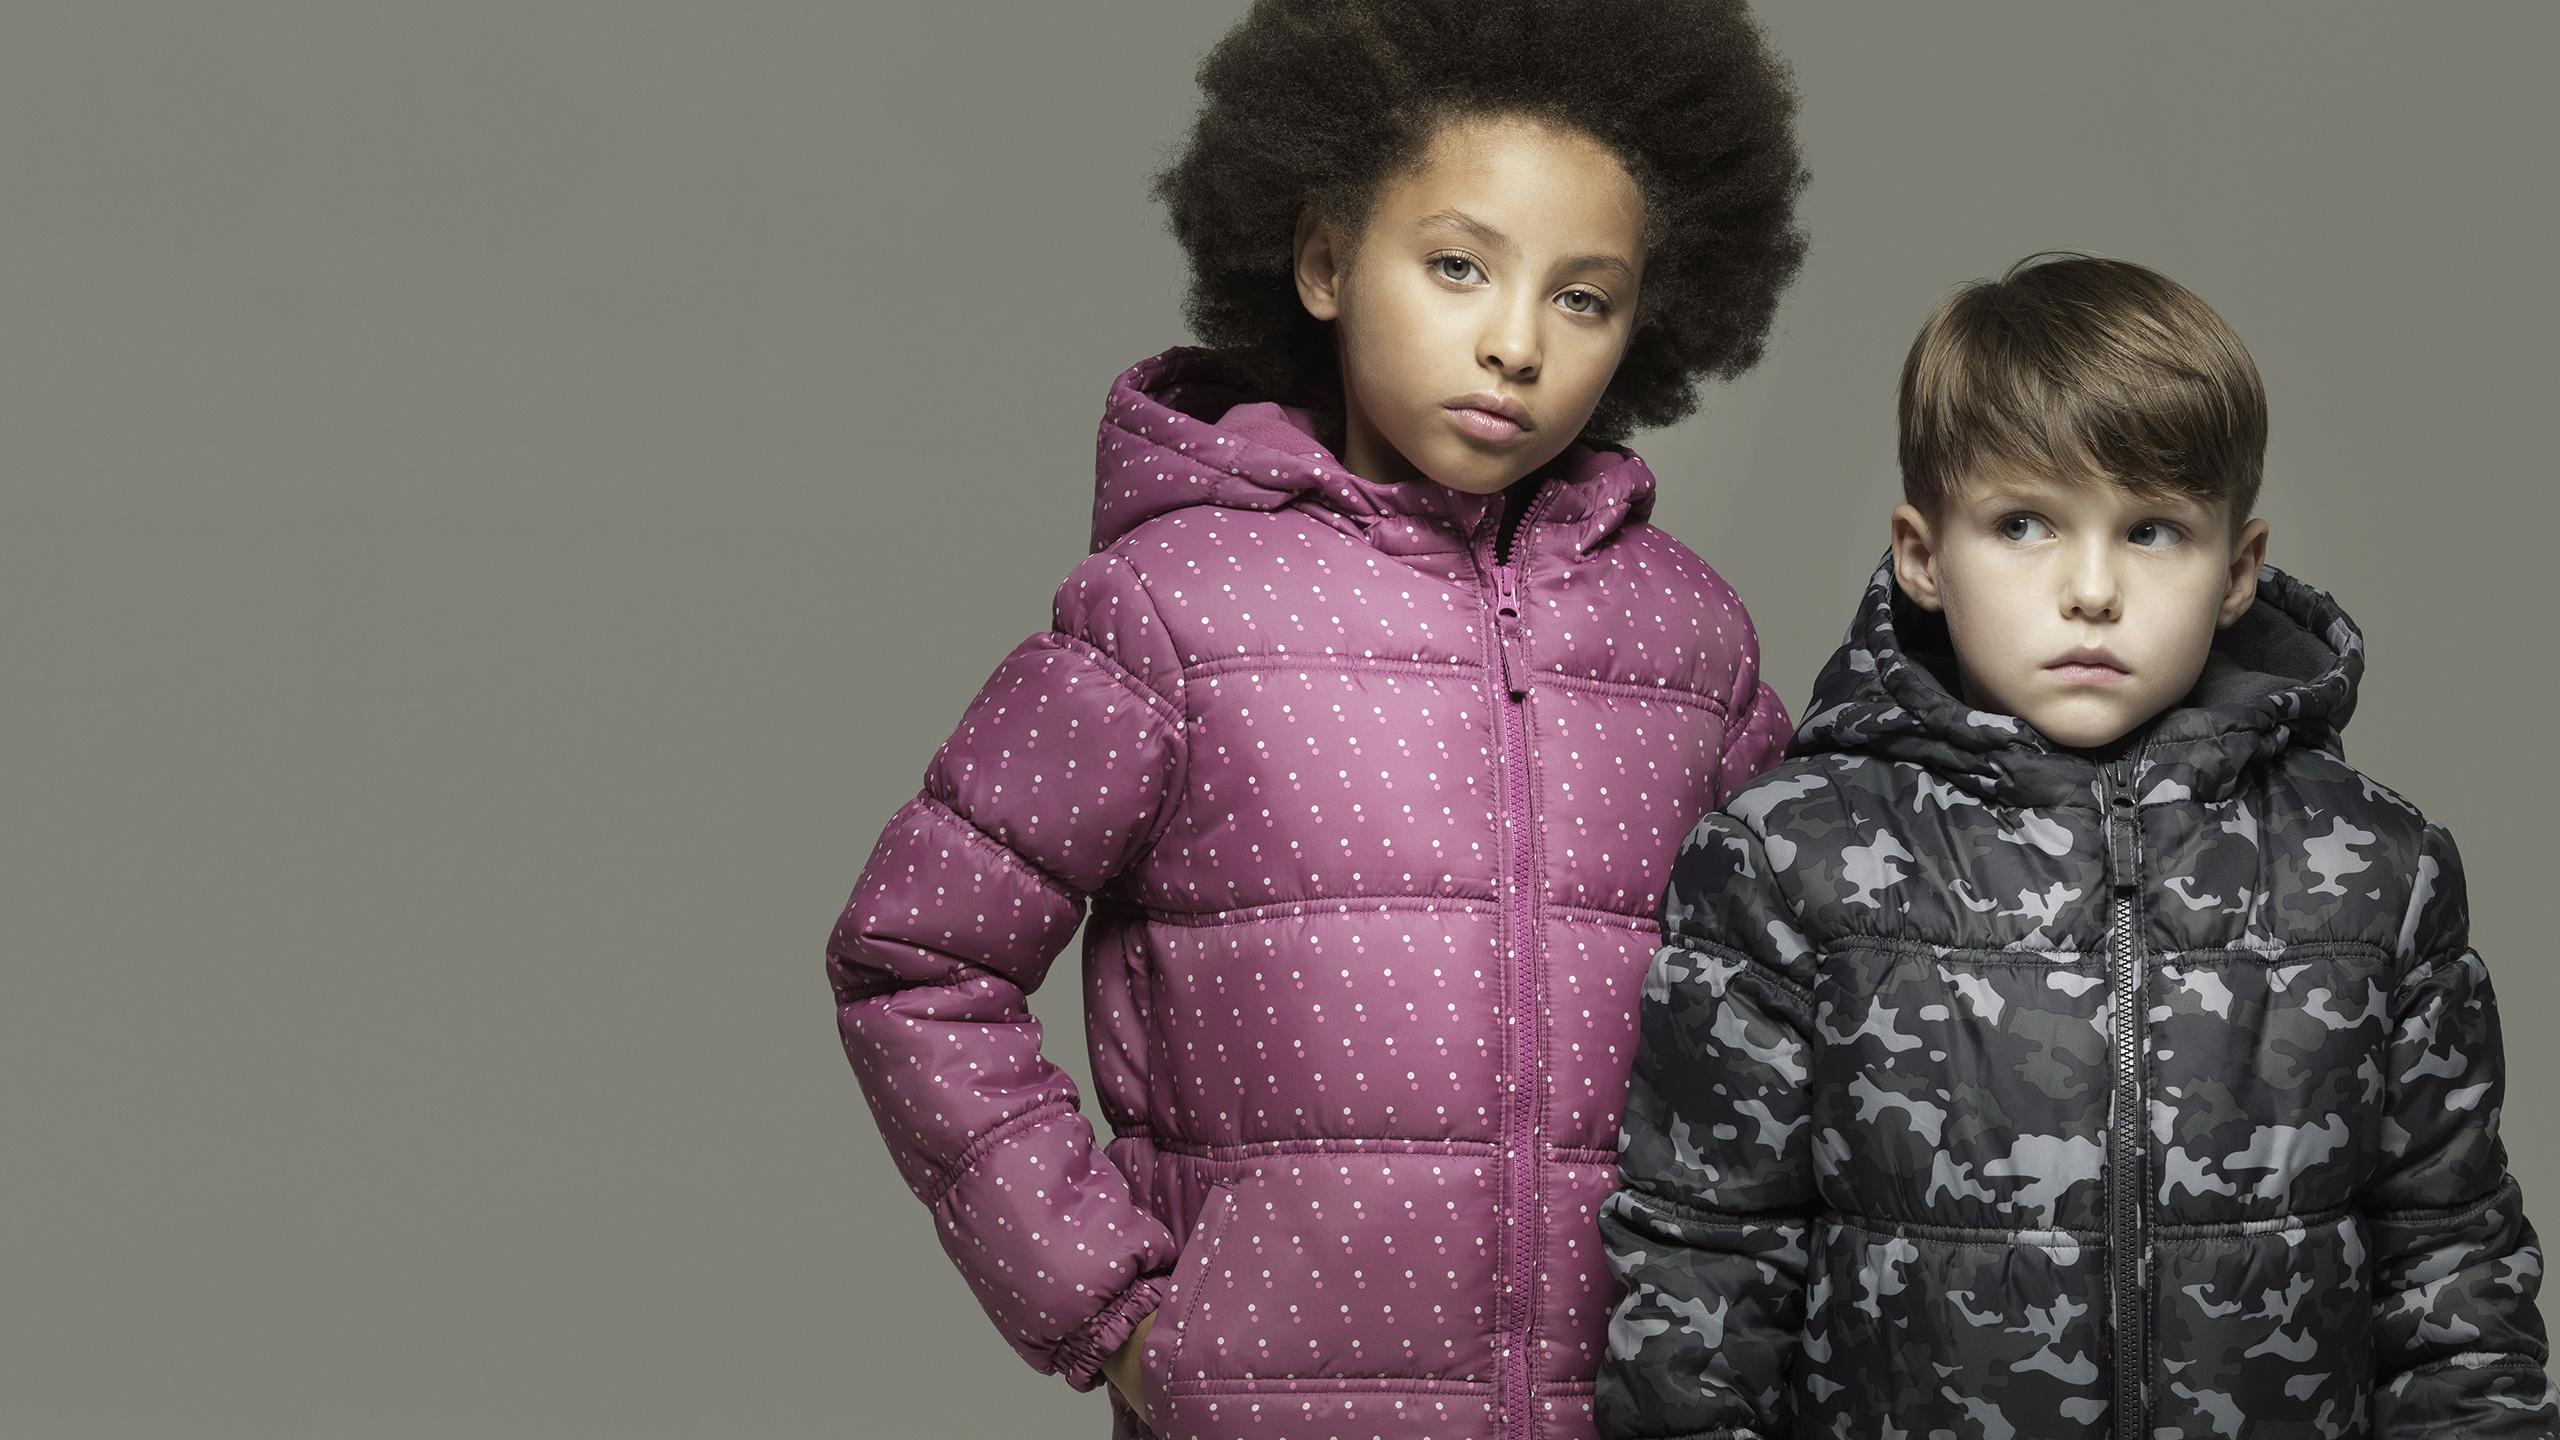 Scolari-Archivio-kids-11